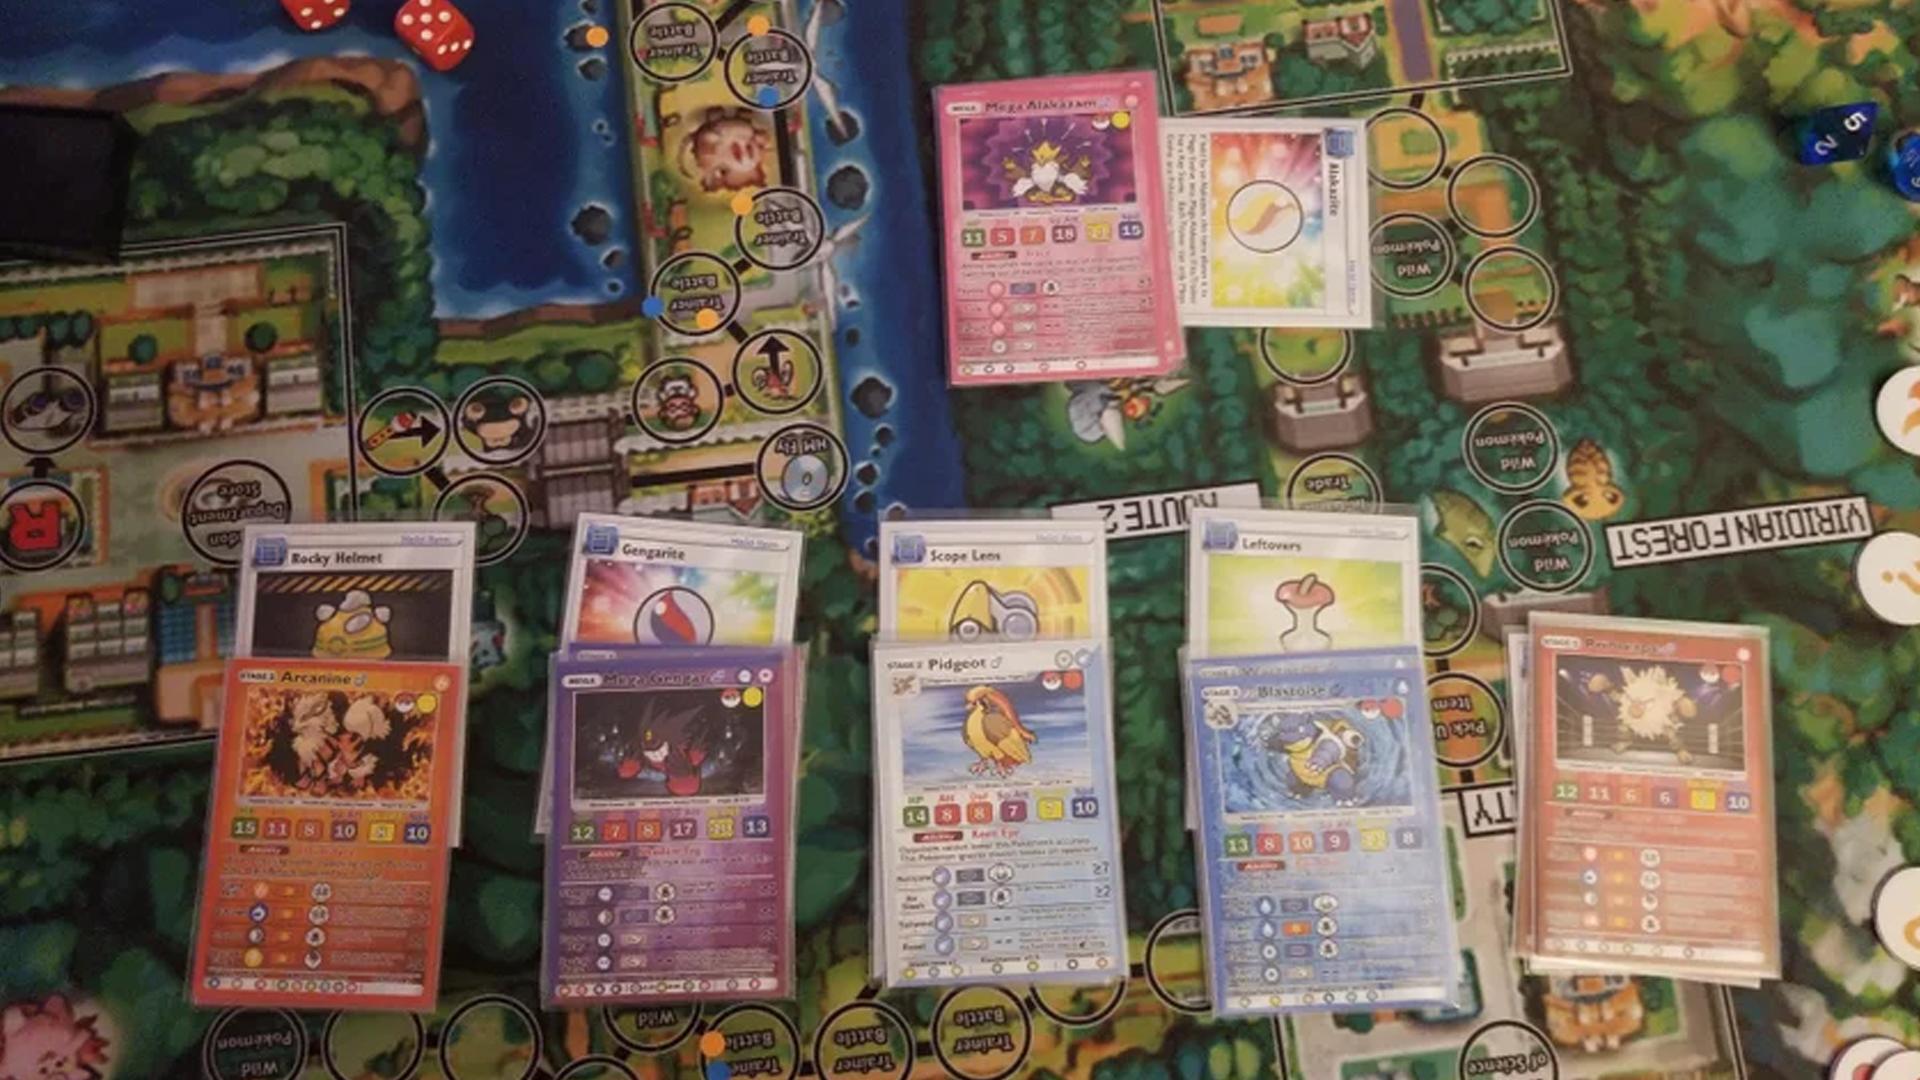 Ultimate Pokémon board game layout image